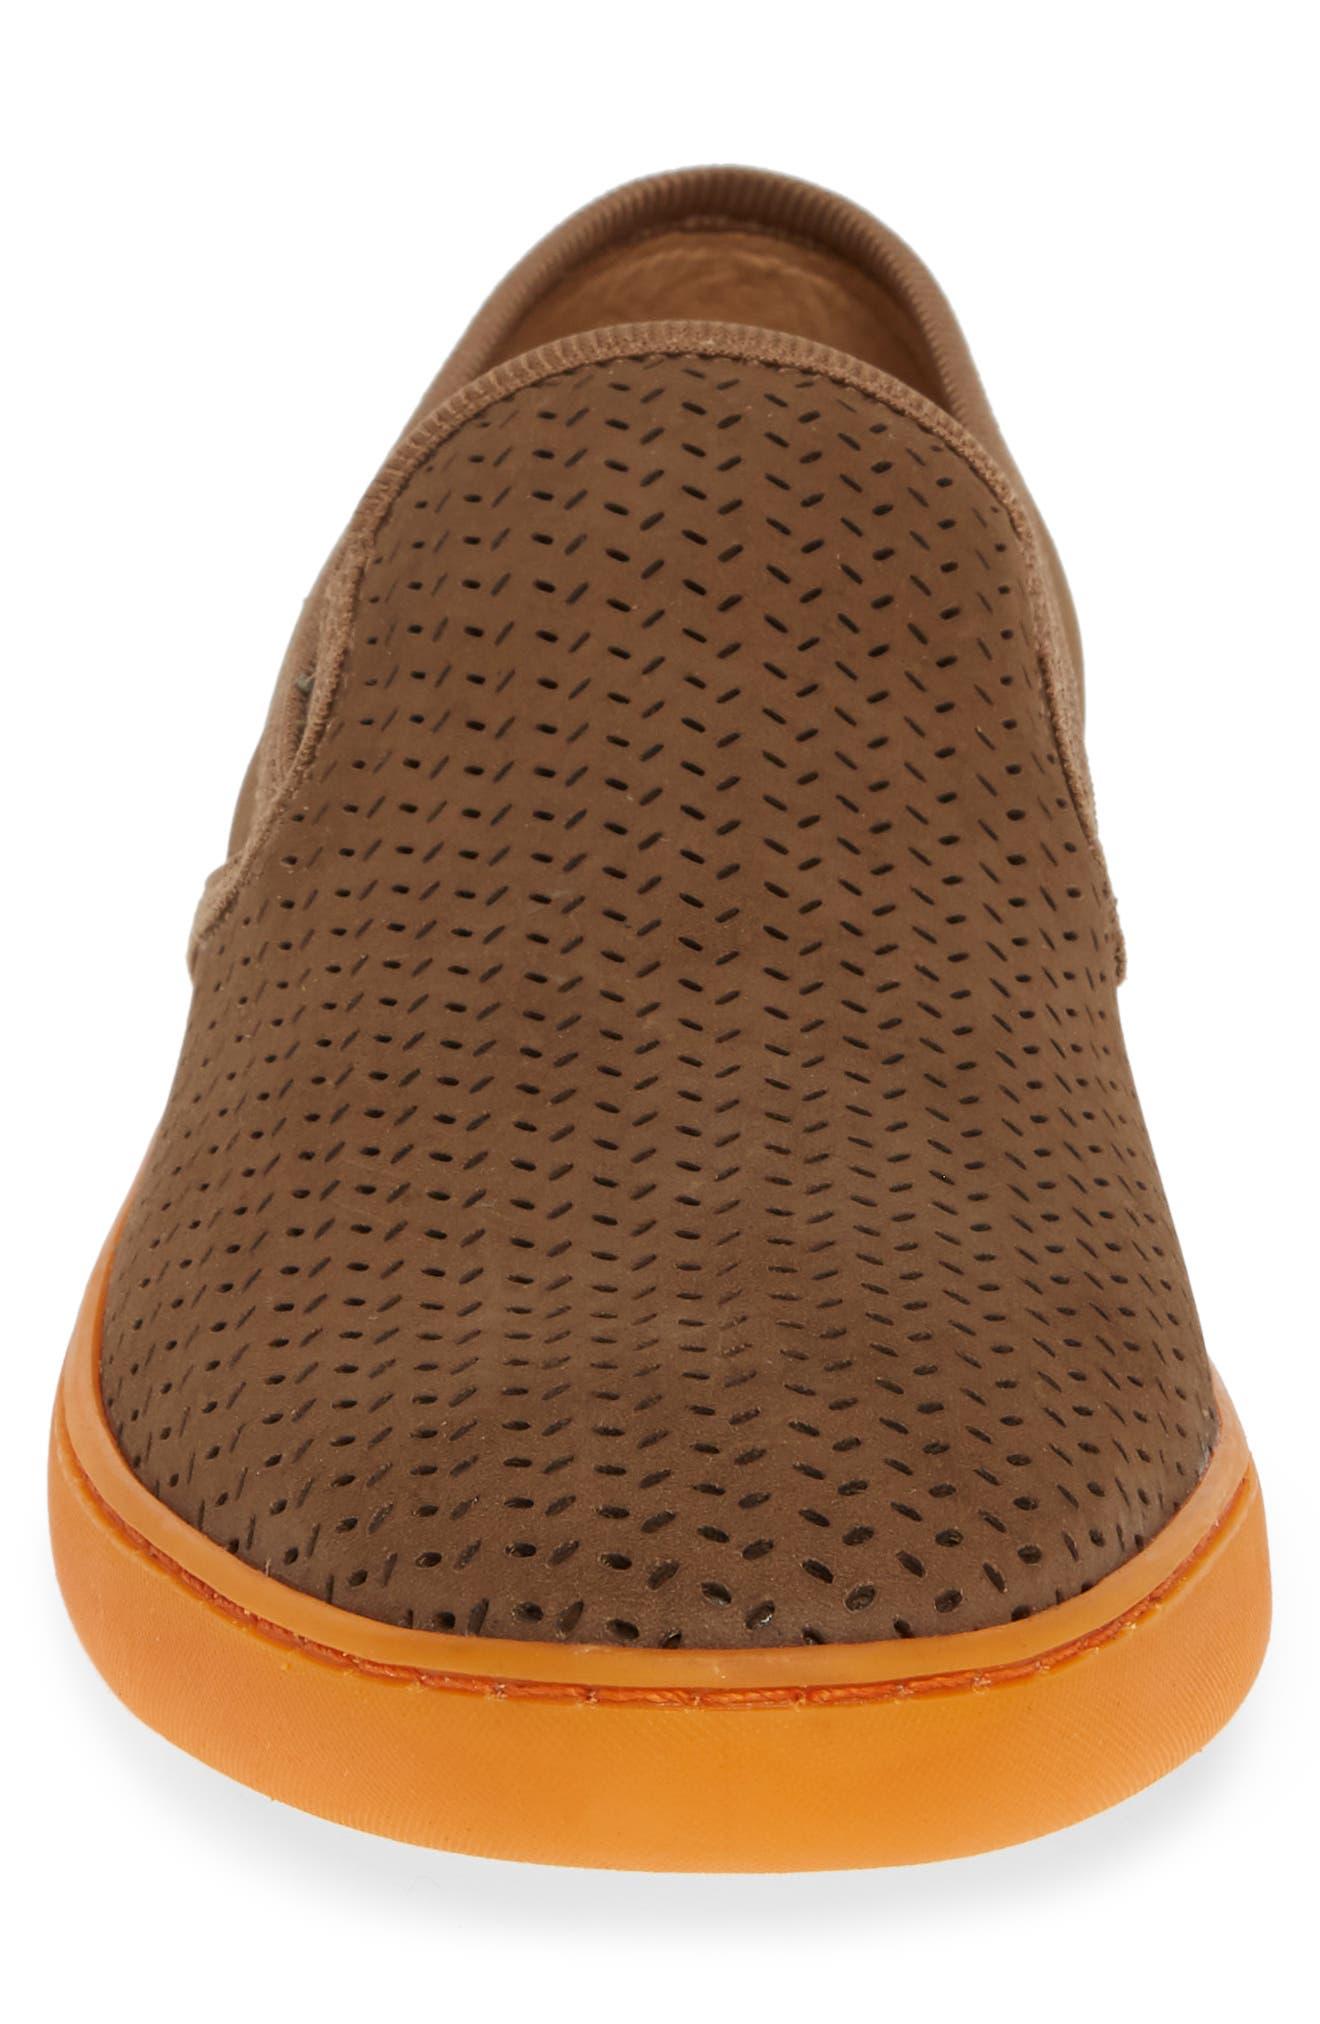 Malibu Perforated Loafer,                             Alternate thumbnail 4, color,                             SAND NUBUCK